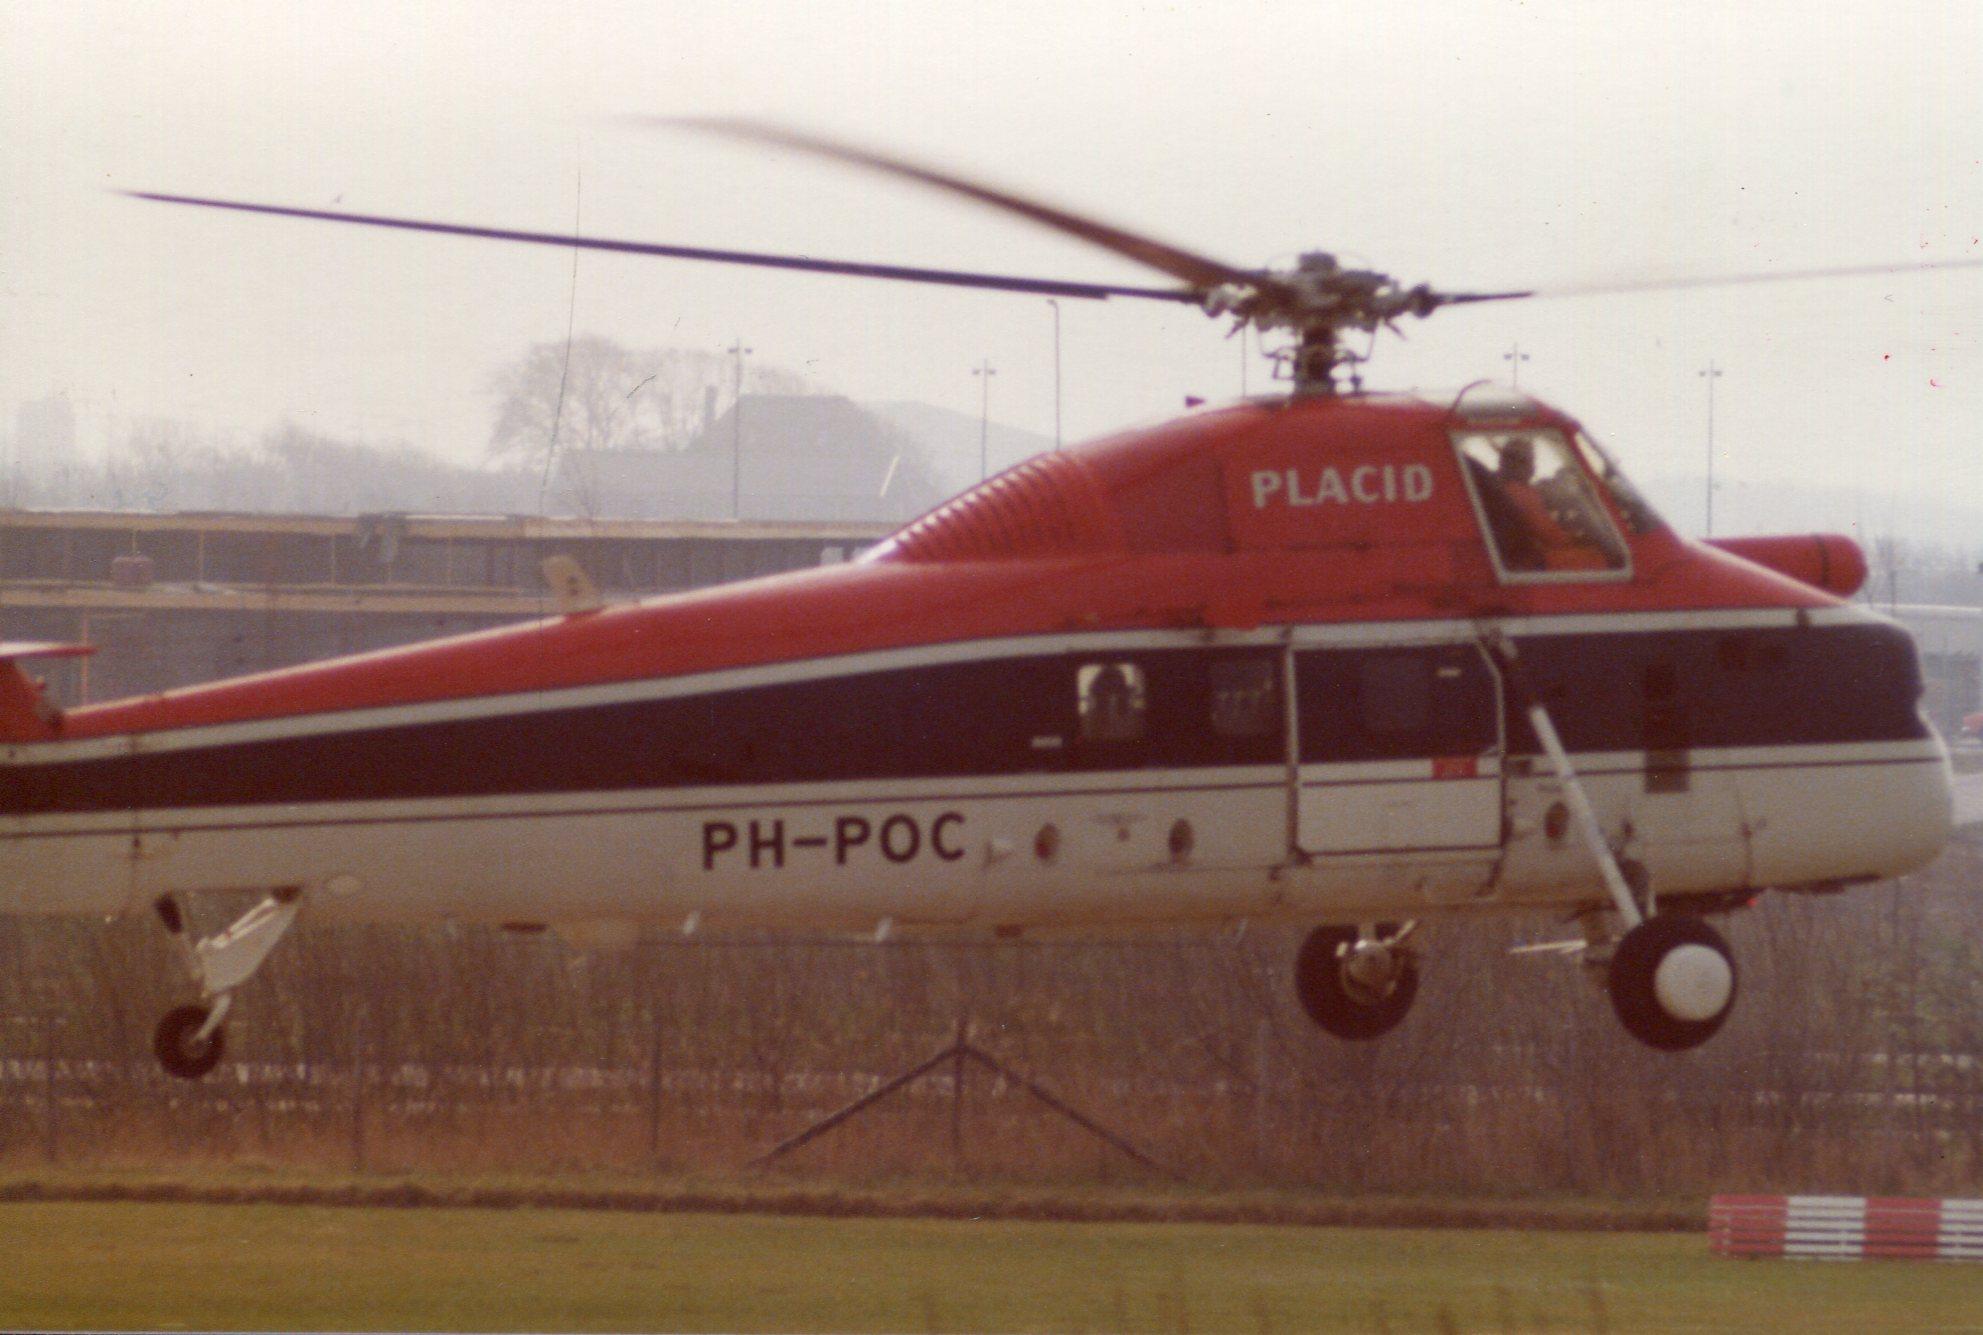 Naam: Den Helder , april 1977.jpg Bekeken: 214 Grootte: 279,4 KB